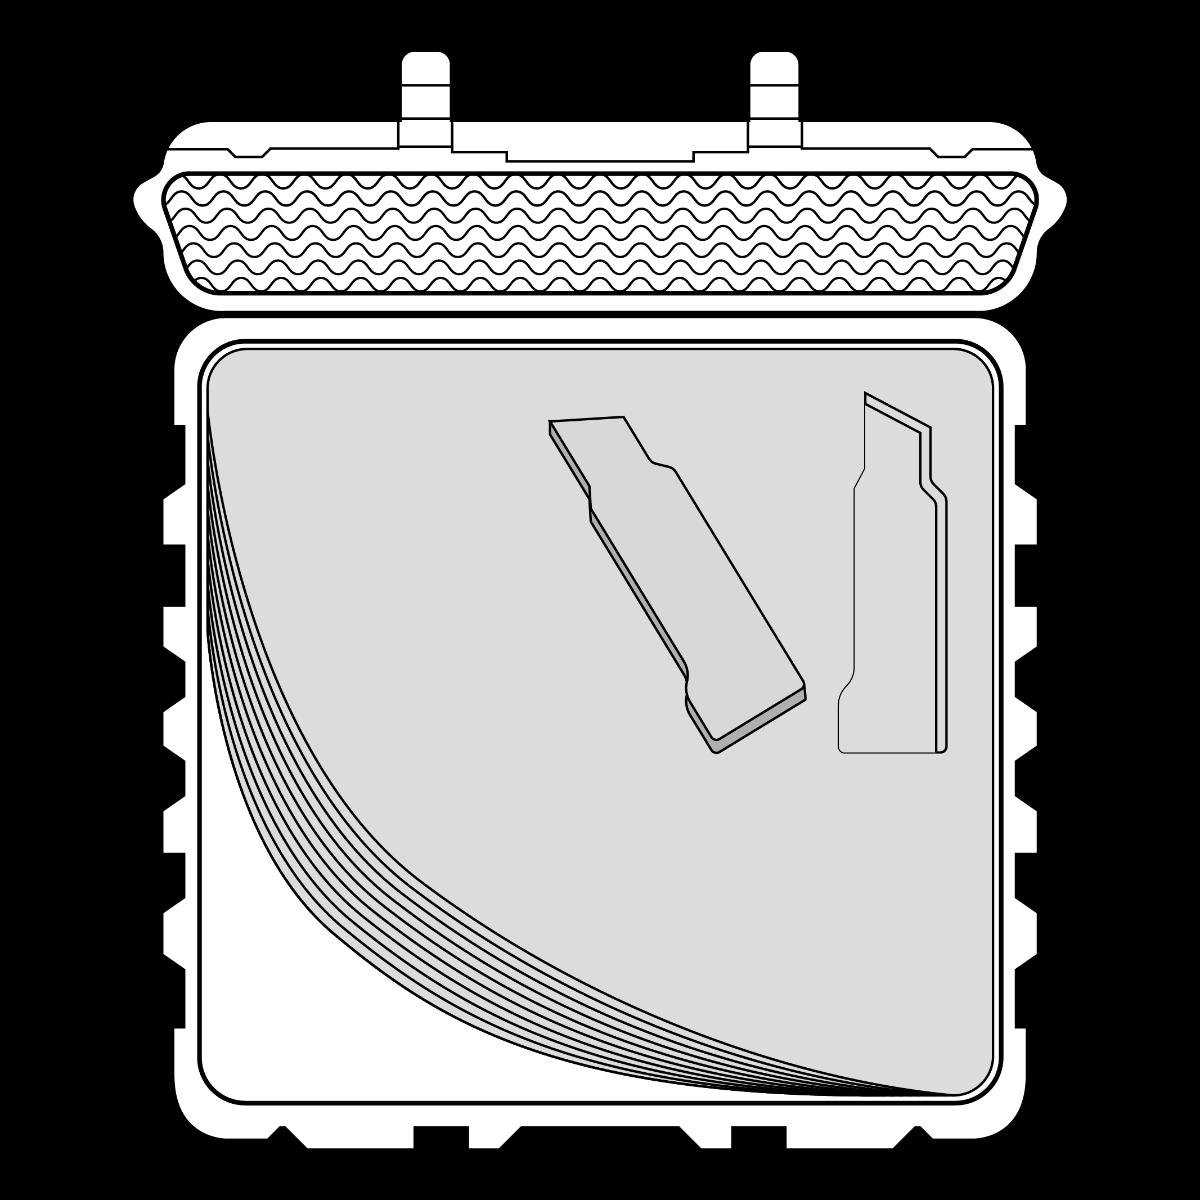 MLF - Multilayer Foam